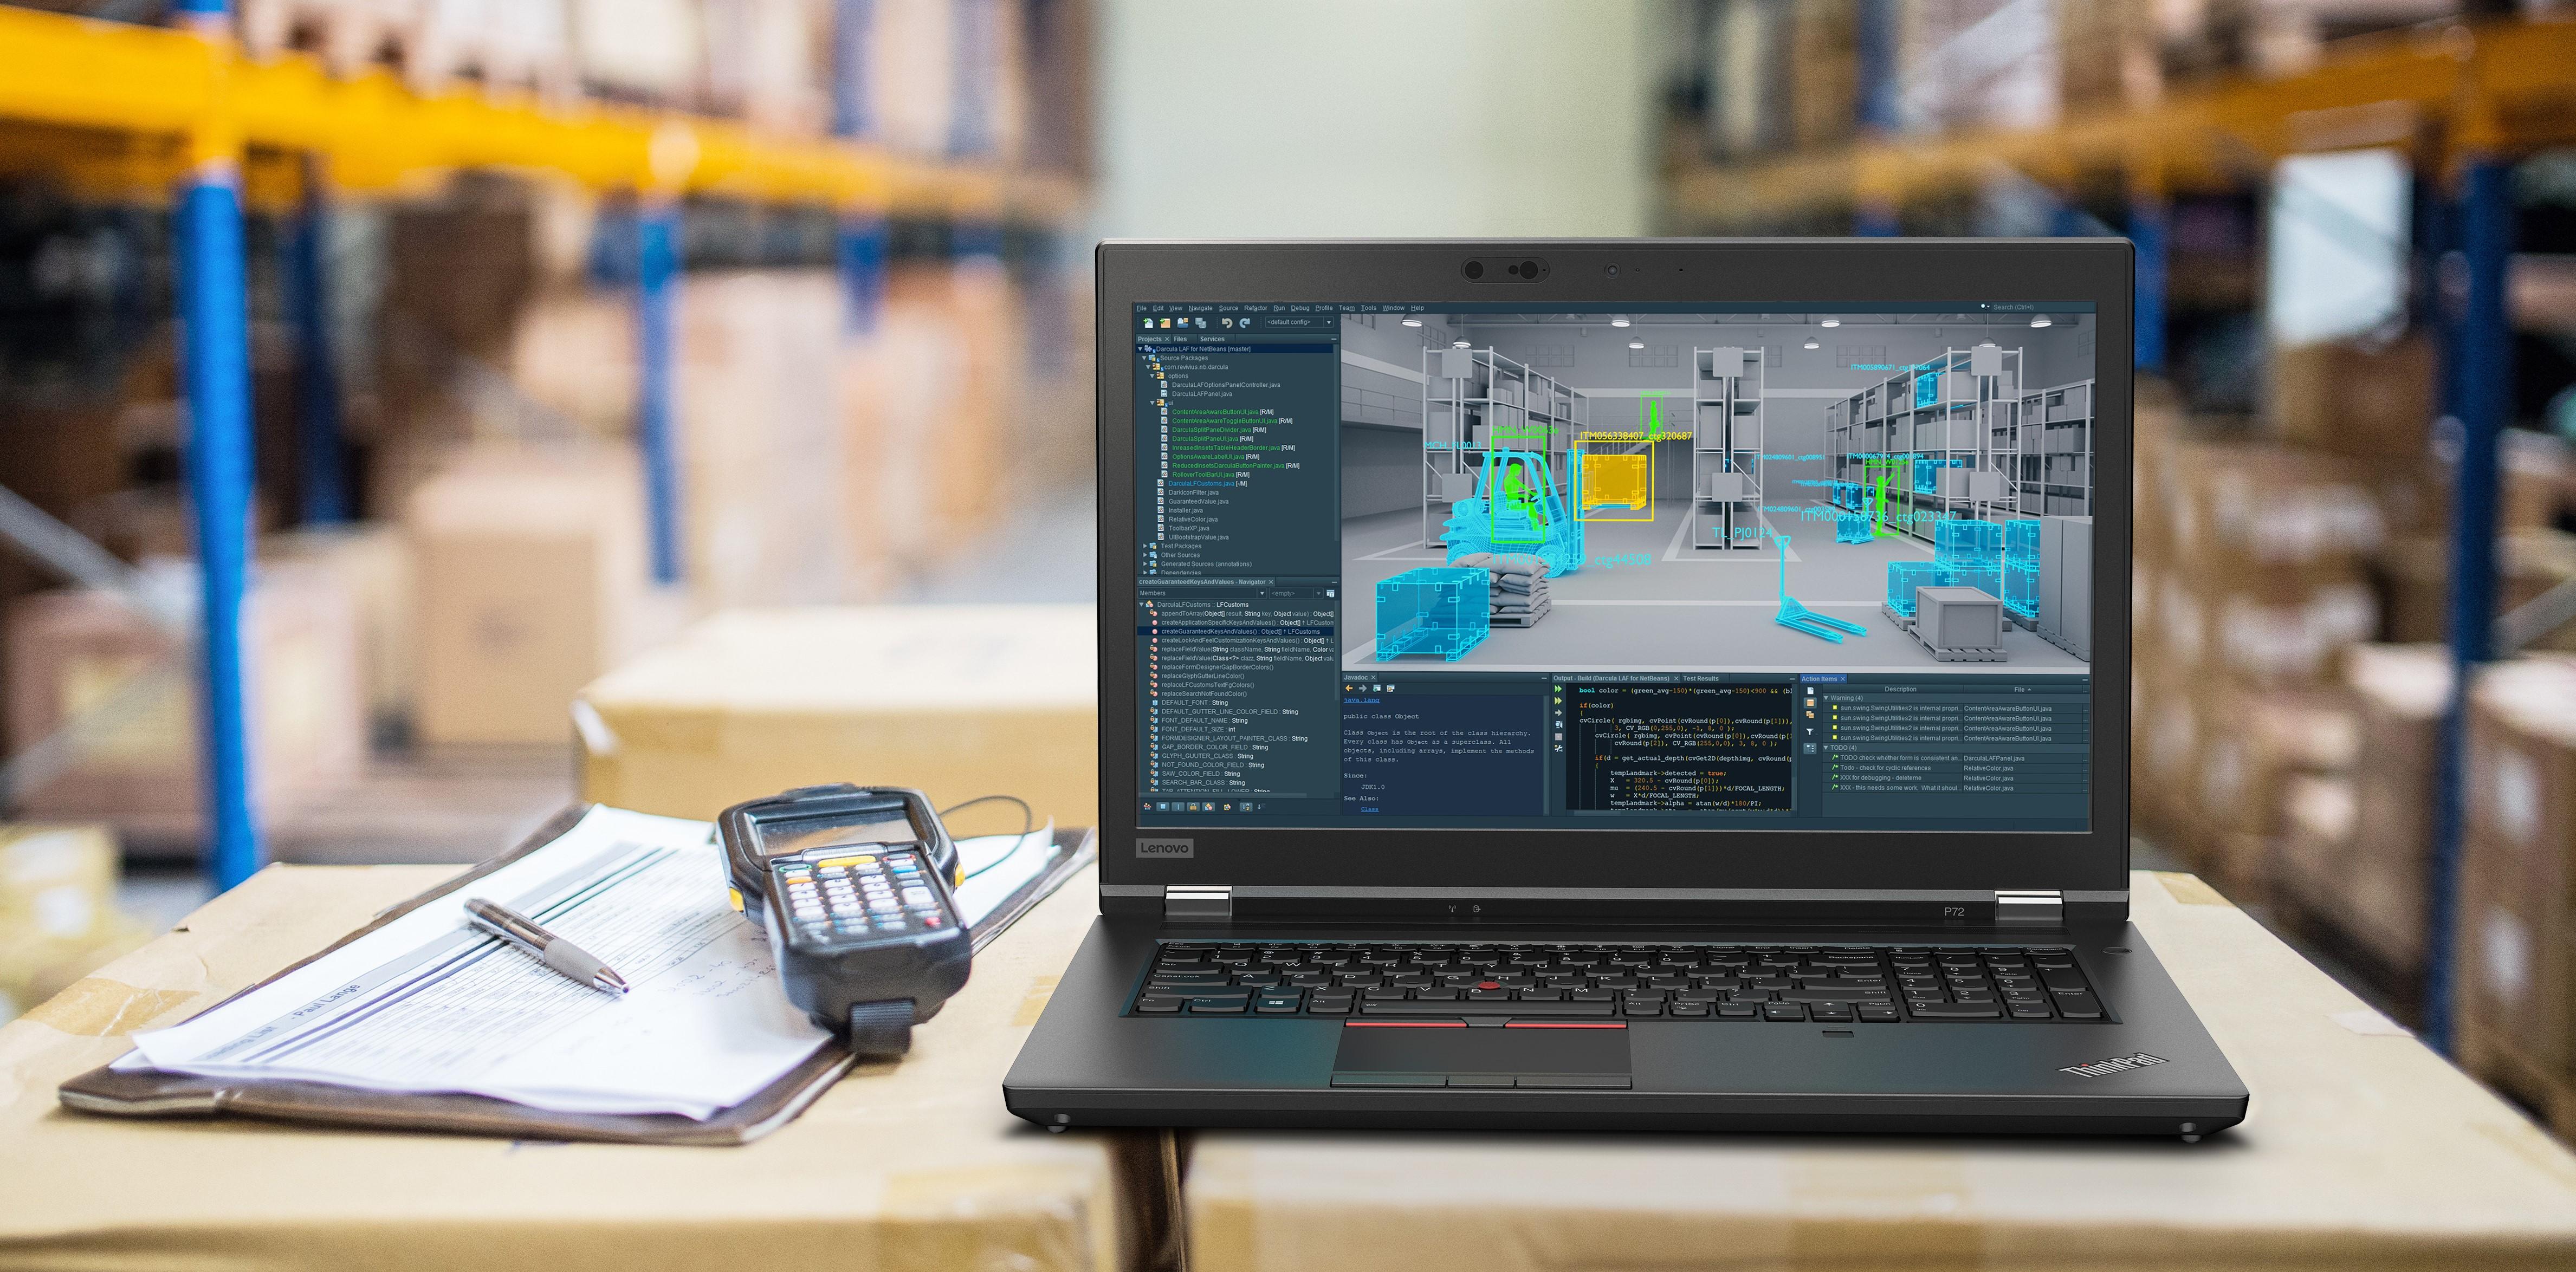 Lenovo ThinkPad P72: Thinner design & Nvidia Quadro P5200 for